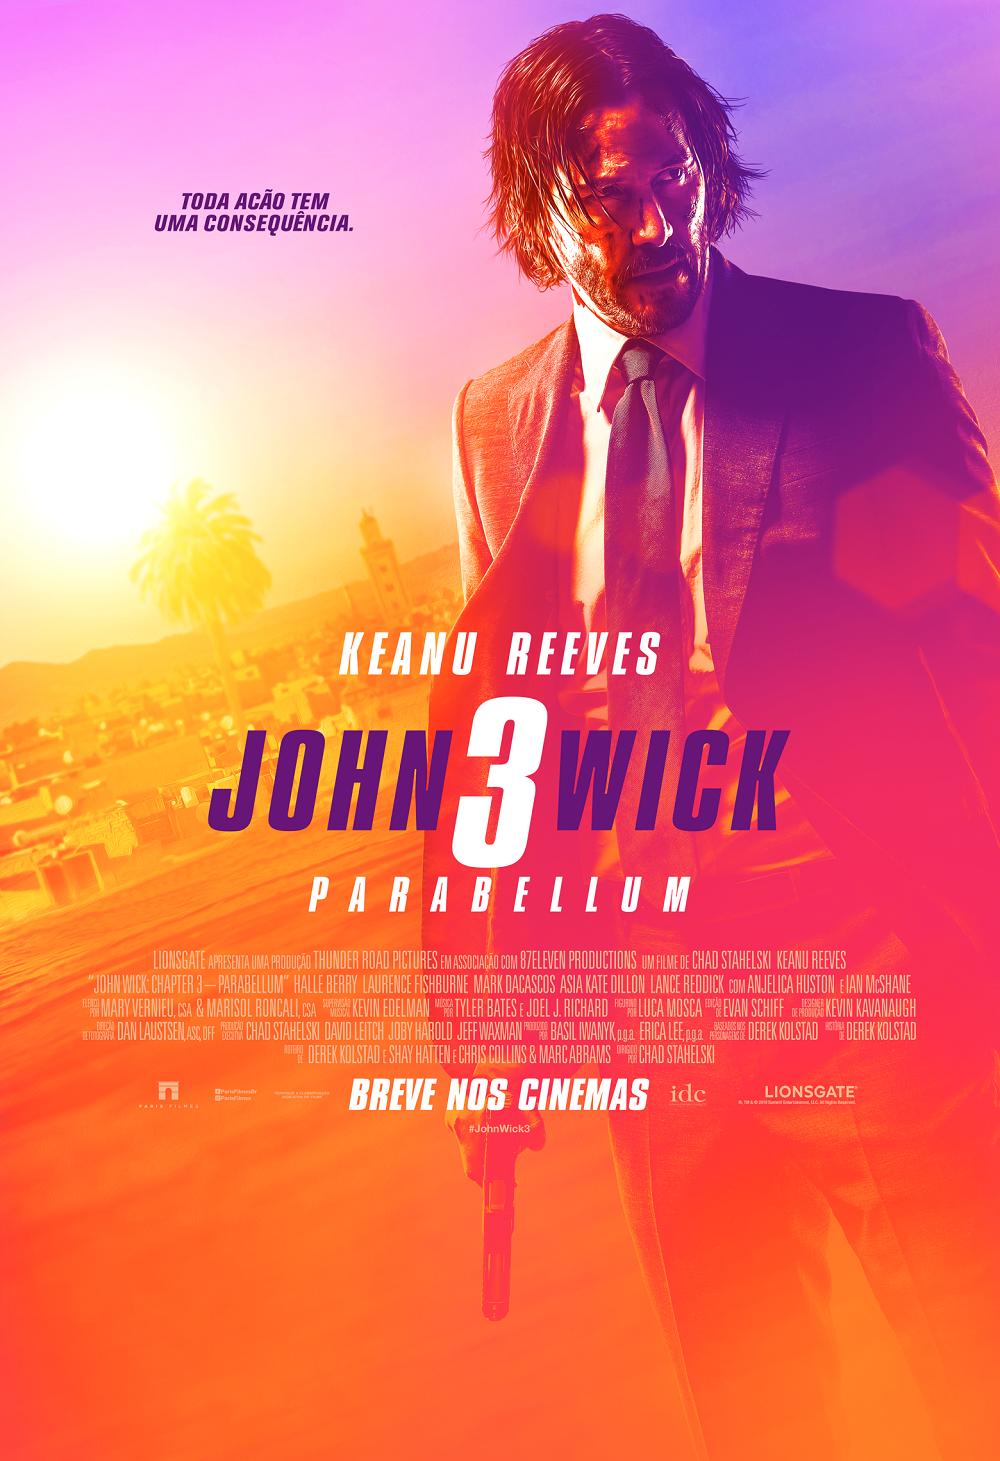 john wick 3 - parabellum Chad Stahelski keanu reeves paris filmes (1)